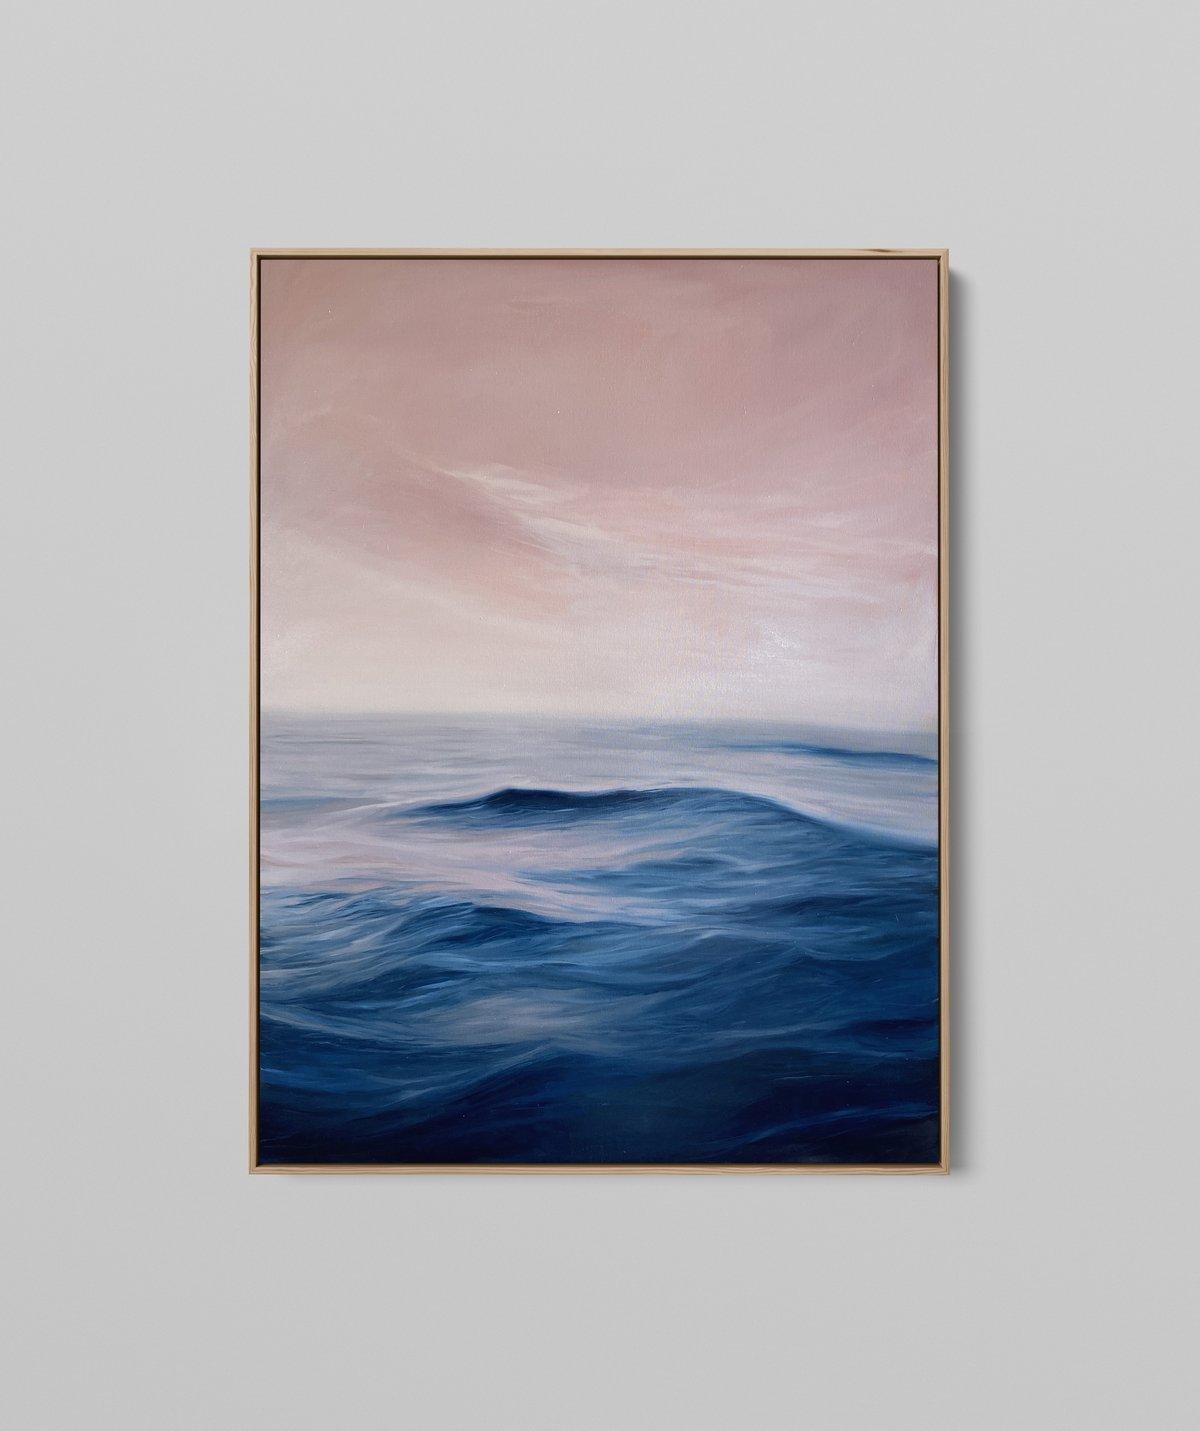 Image of Water No. 37